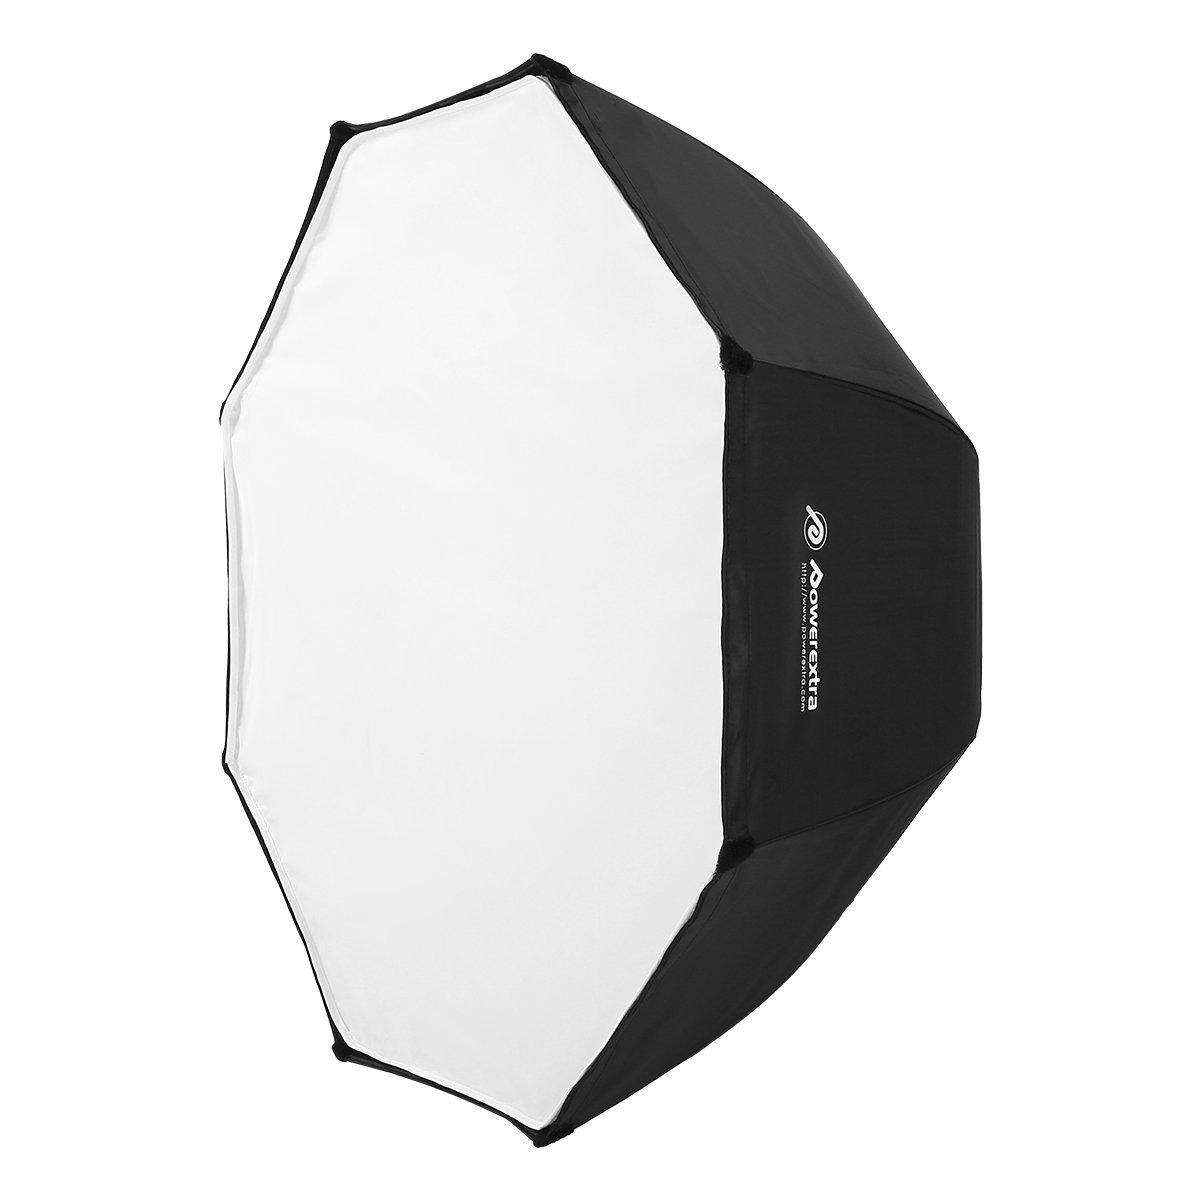 57e6a5e8f7e9 Powerextra 32″/ 80cm Octagon Softbox Umbrella Softbox Reflector ...